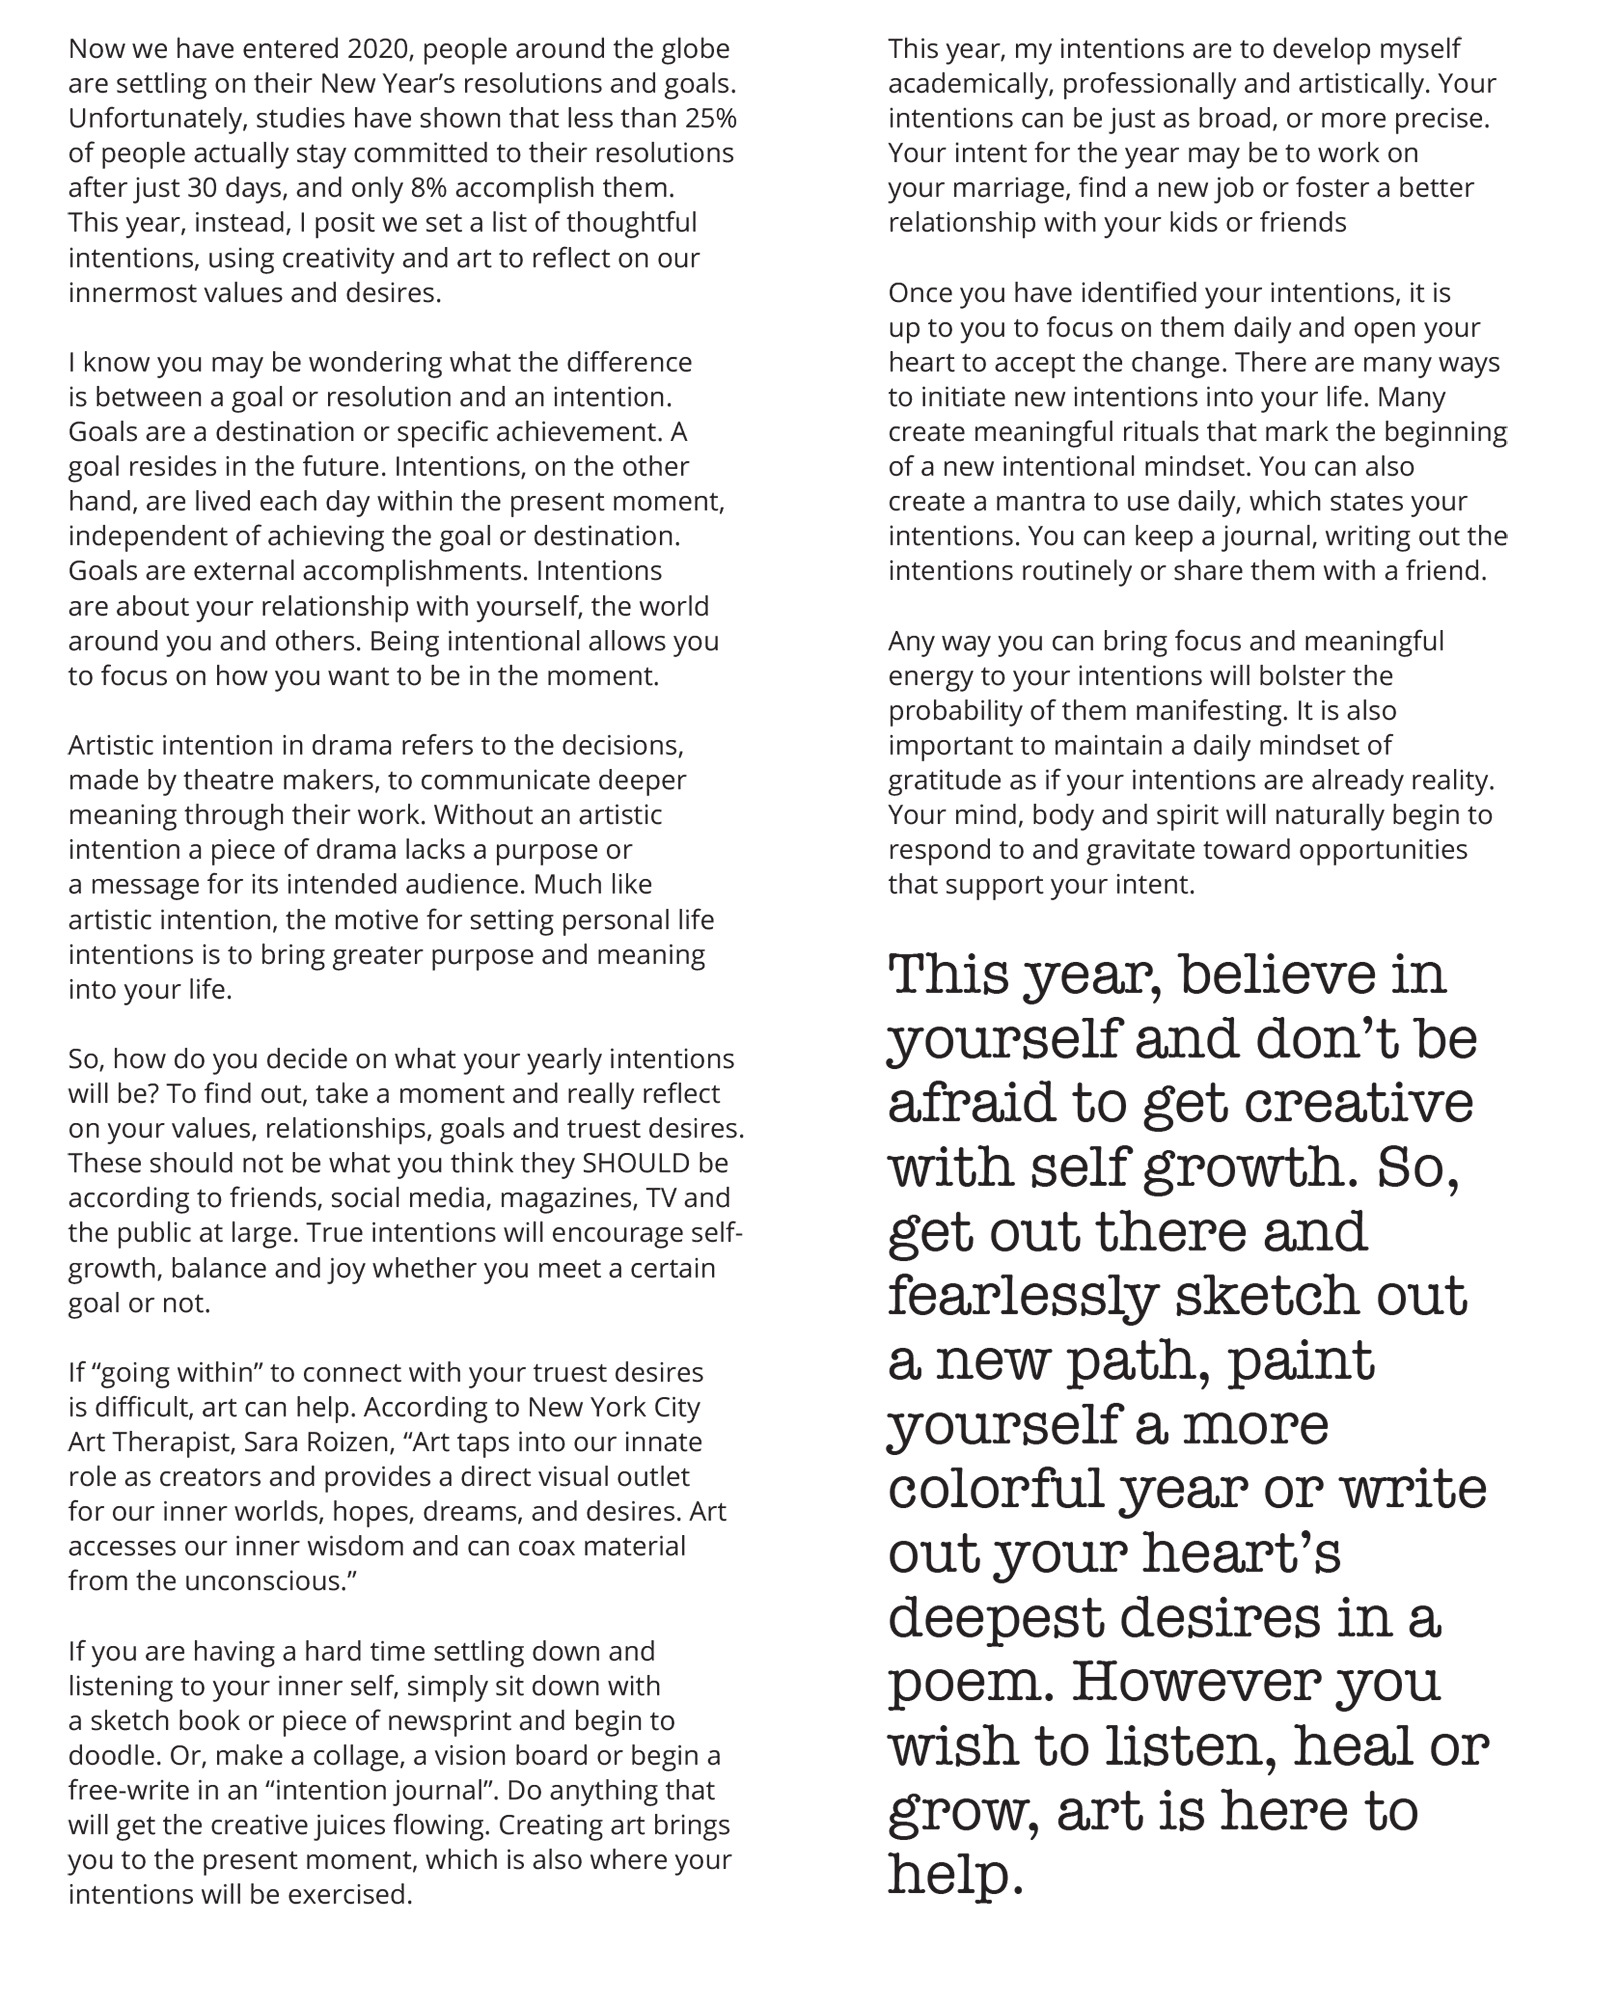 https://sandiegoveteransmagazine.com/wp-content/uploads/2020/08/art-Jan2.jpg